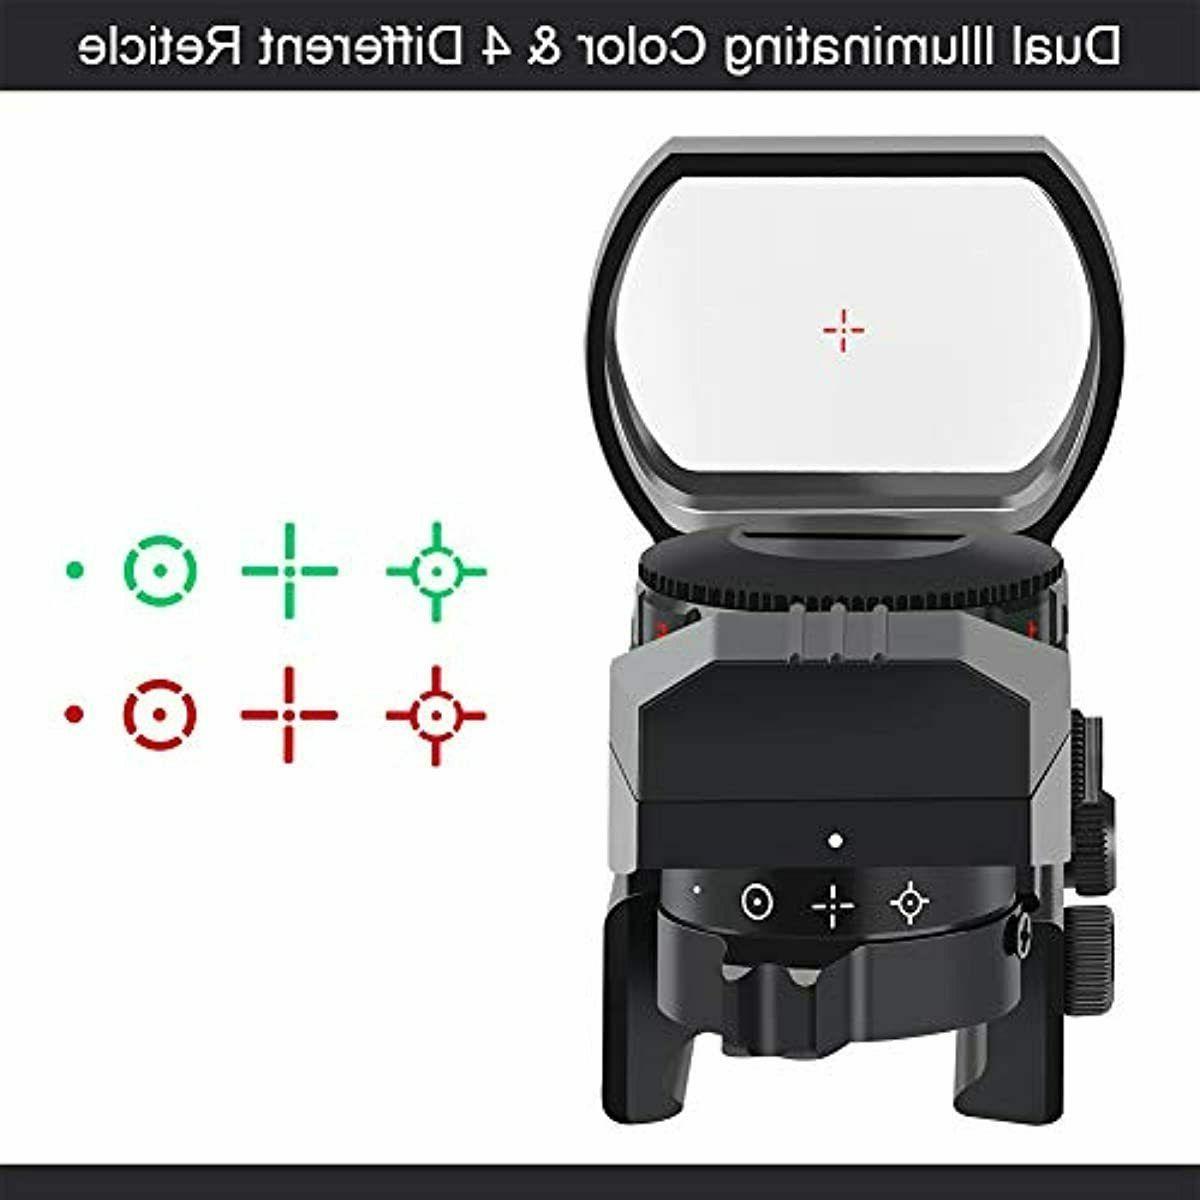 Feyachi Reflex Sight Adjustable and S